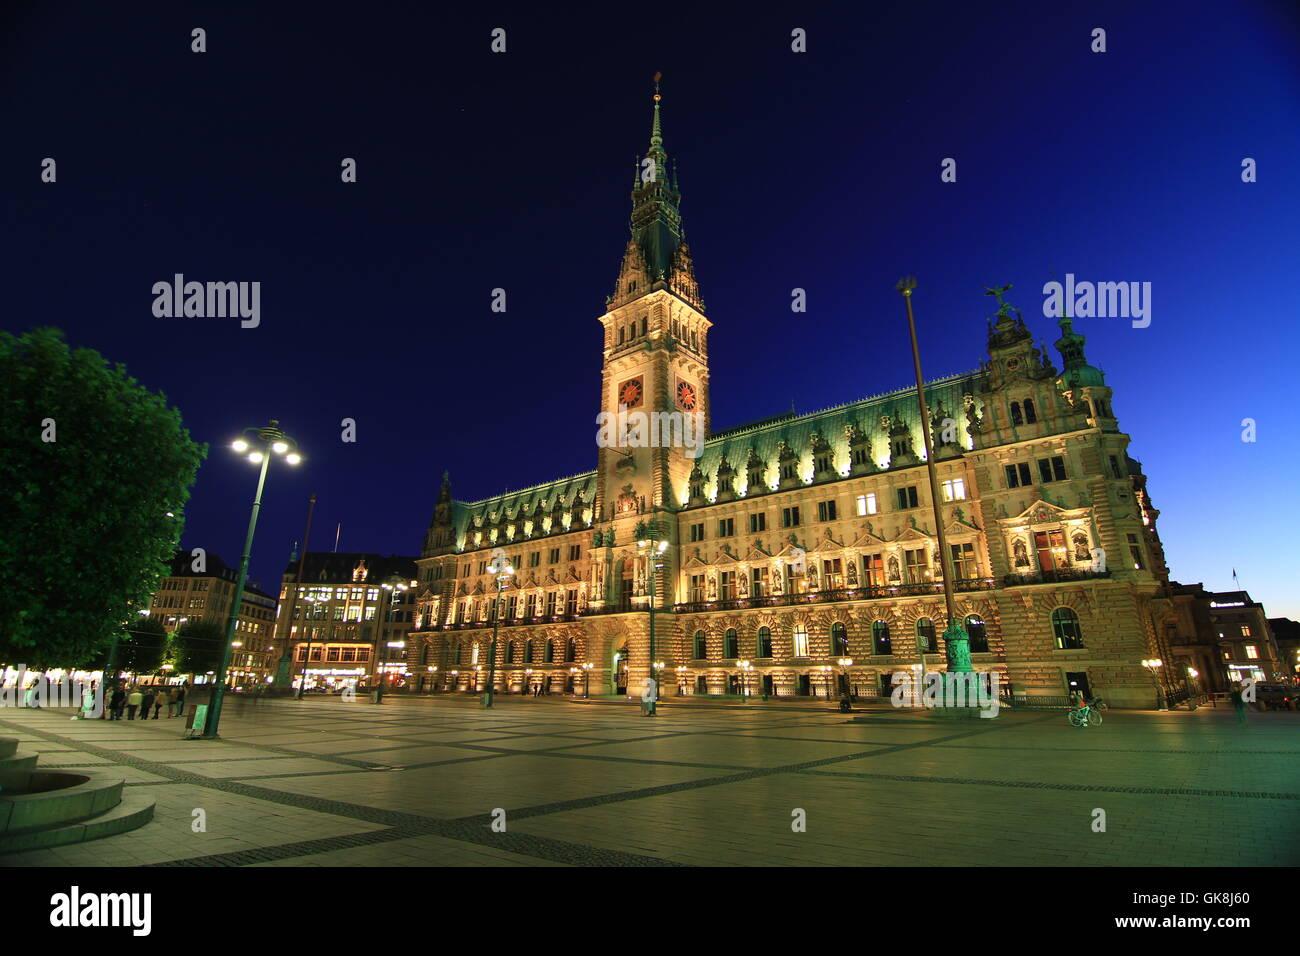 rathausmarkt hamburg - Stock Image